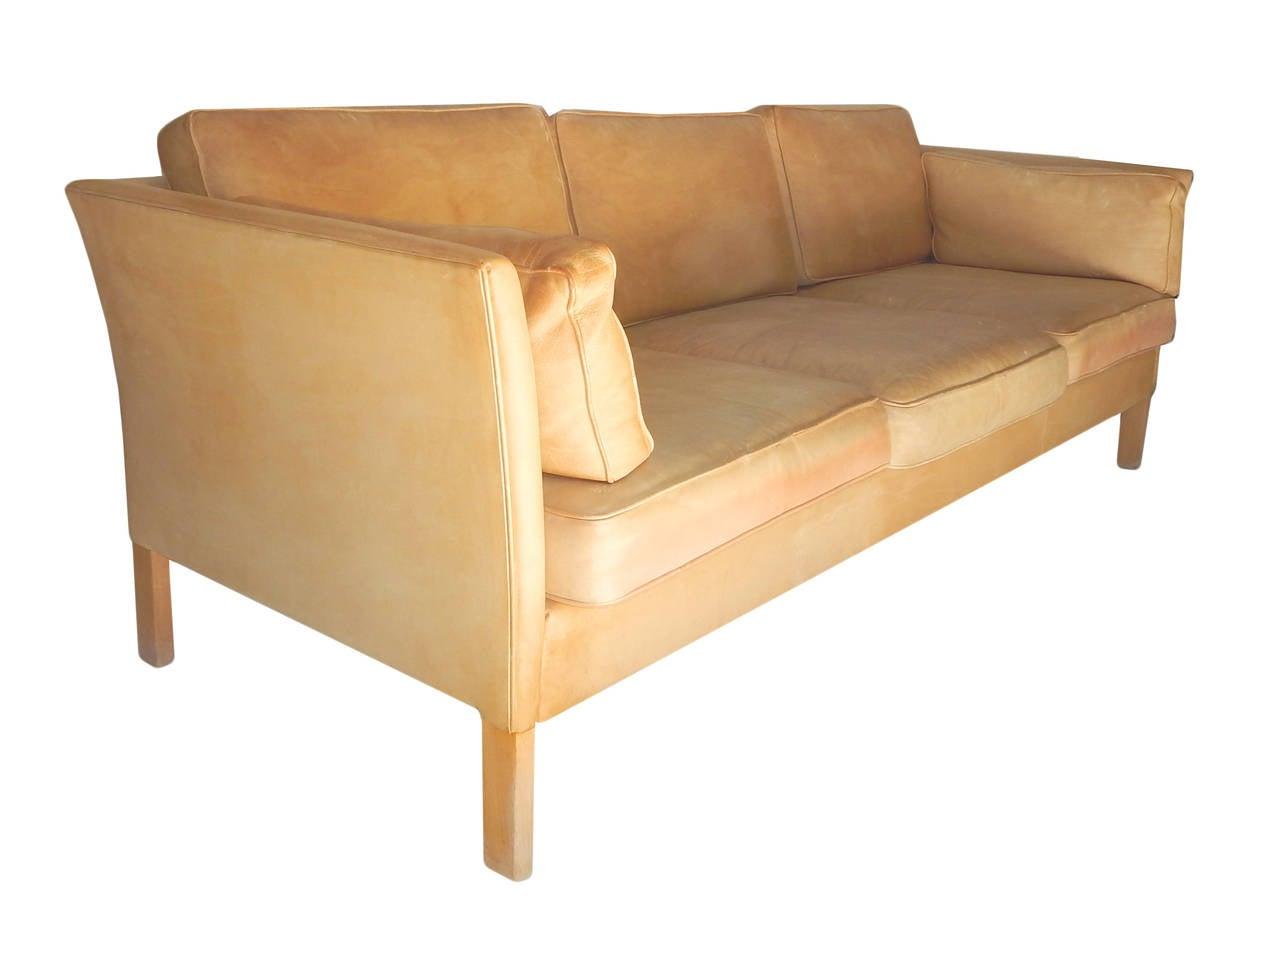 caramel colored leather sofas hamilton rockville md borge morgensen sofa at 1stdibs